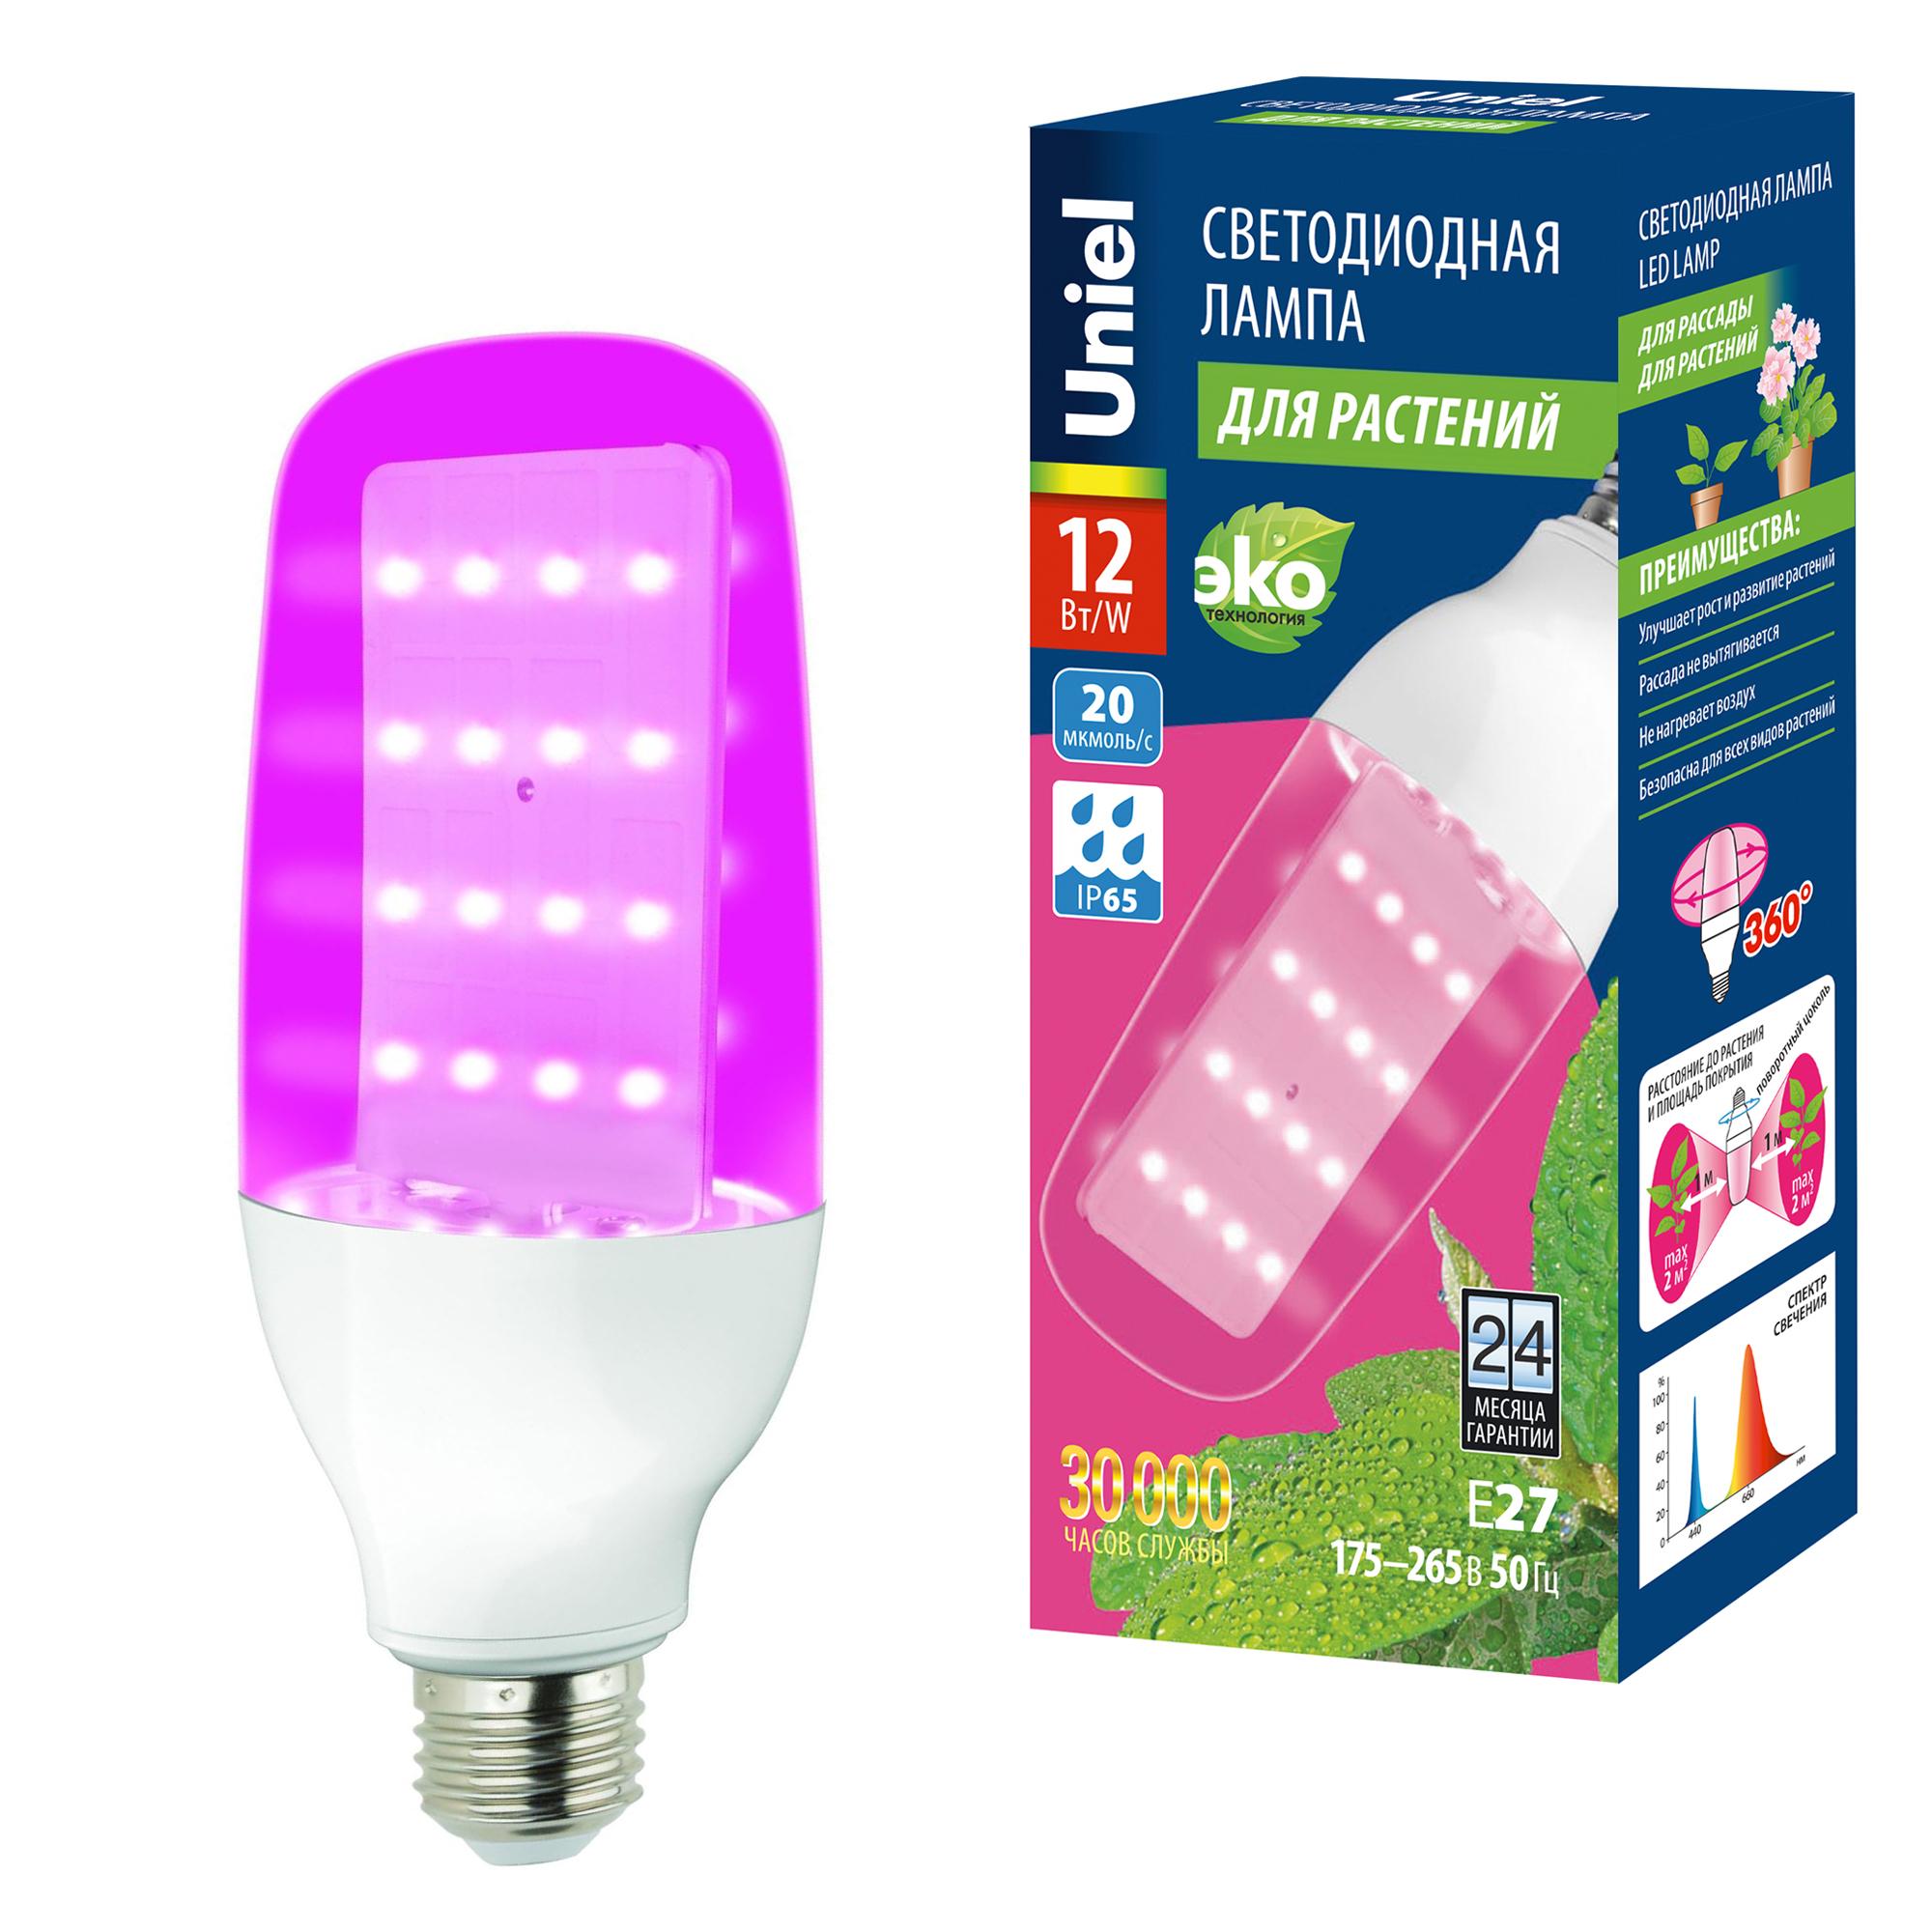 LED-B82-12W/SPBR/E27/CL PLP33WH